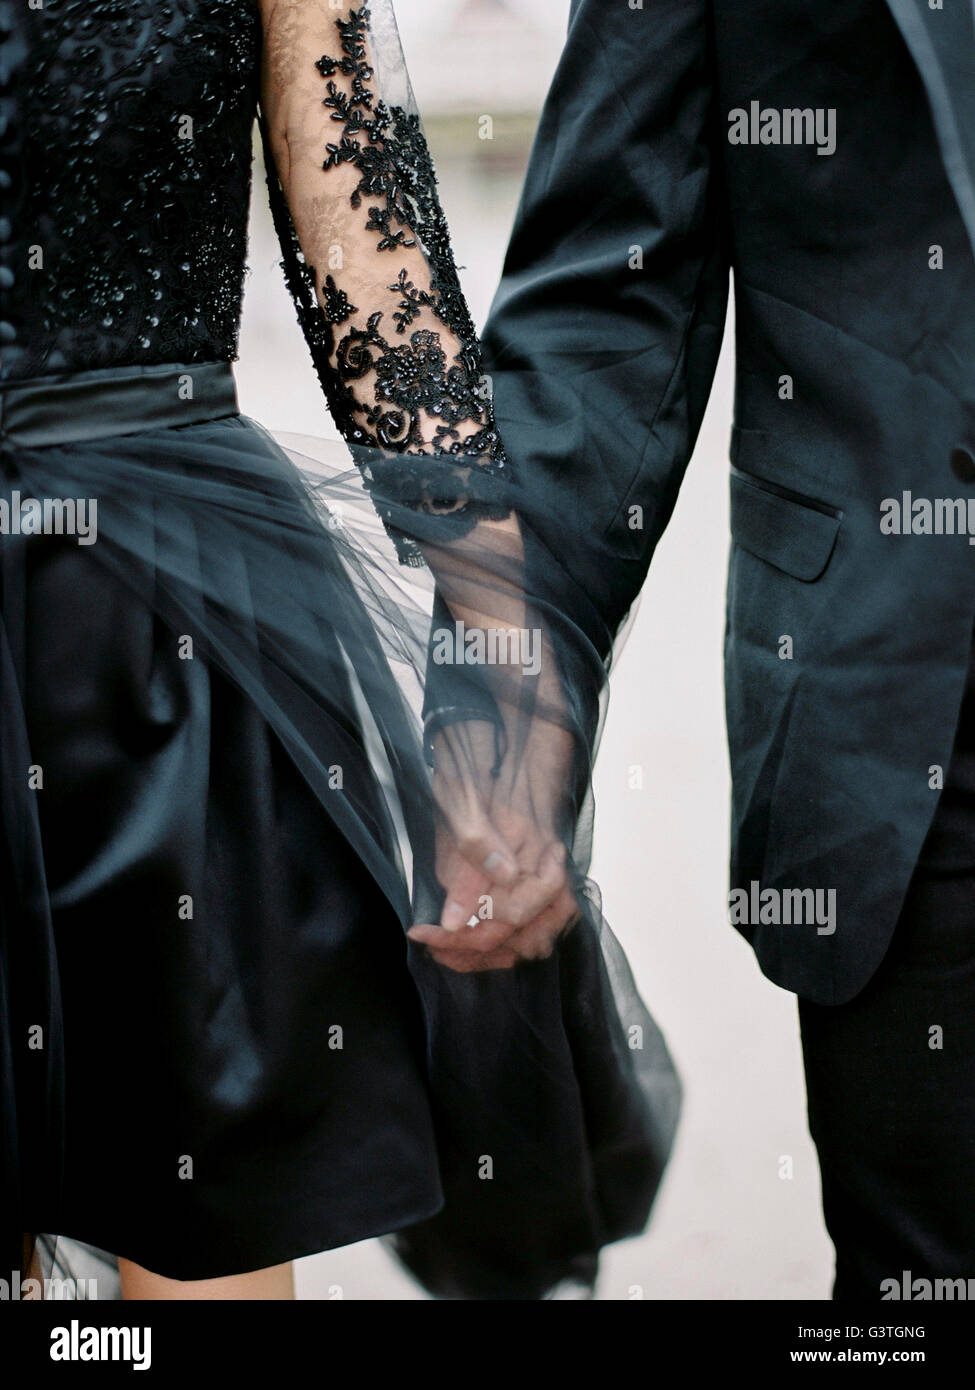 Schweden, Young formell gekleidet paar Hand in Hand Stockbild